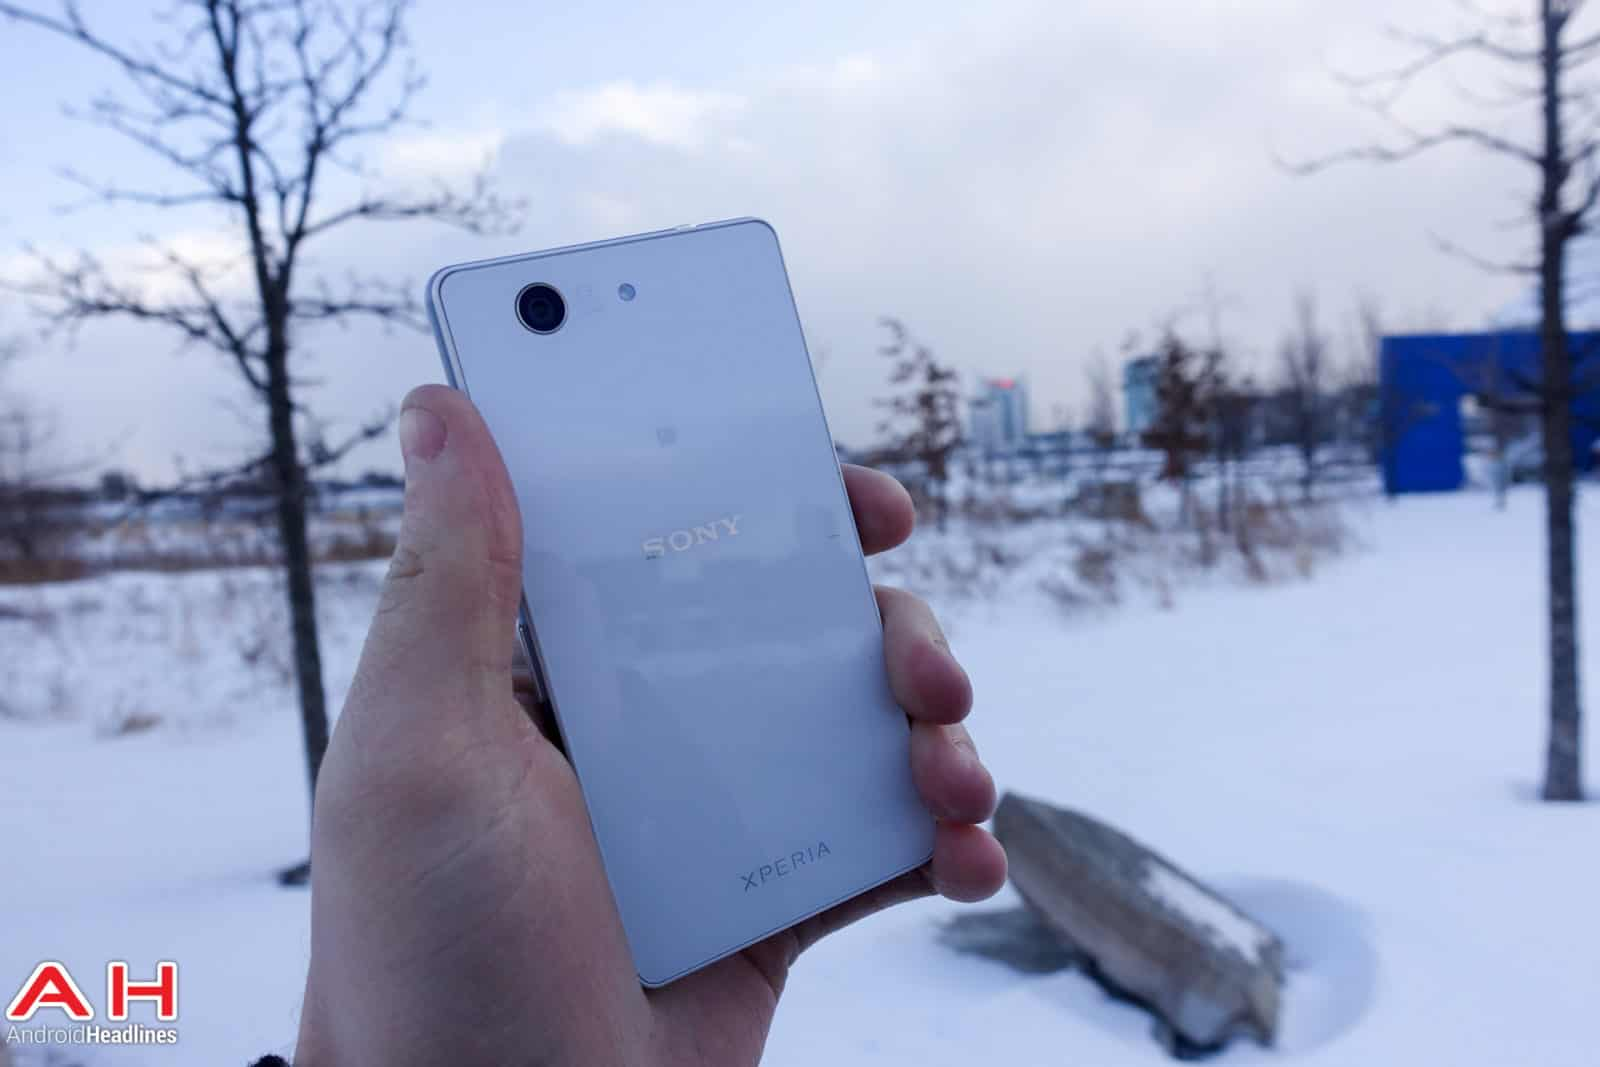 Sony-Xperia-Z3-Compact-AH-03793